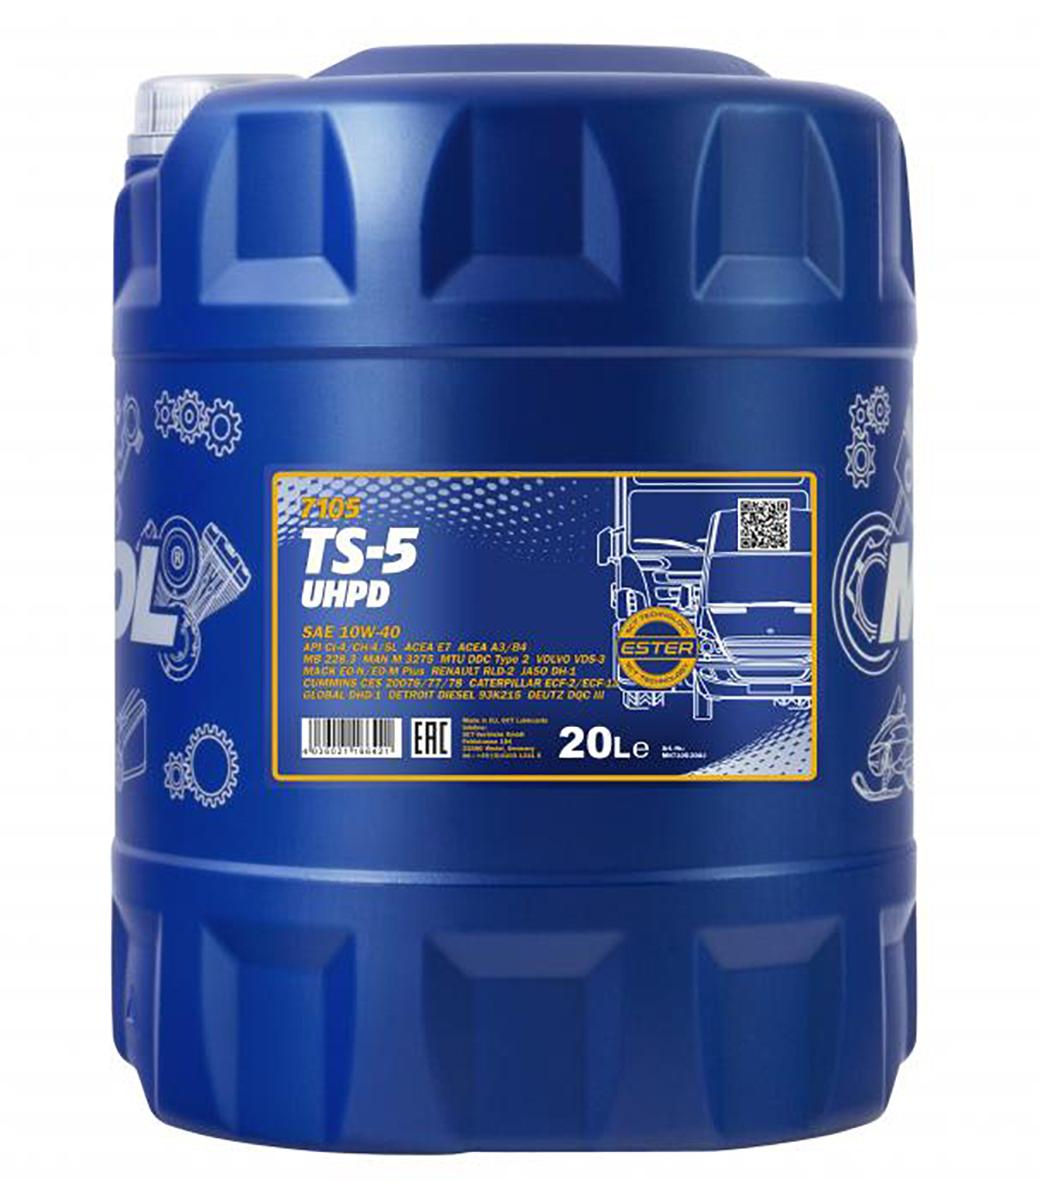 TS-5 UHPD 10W-40